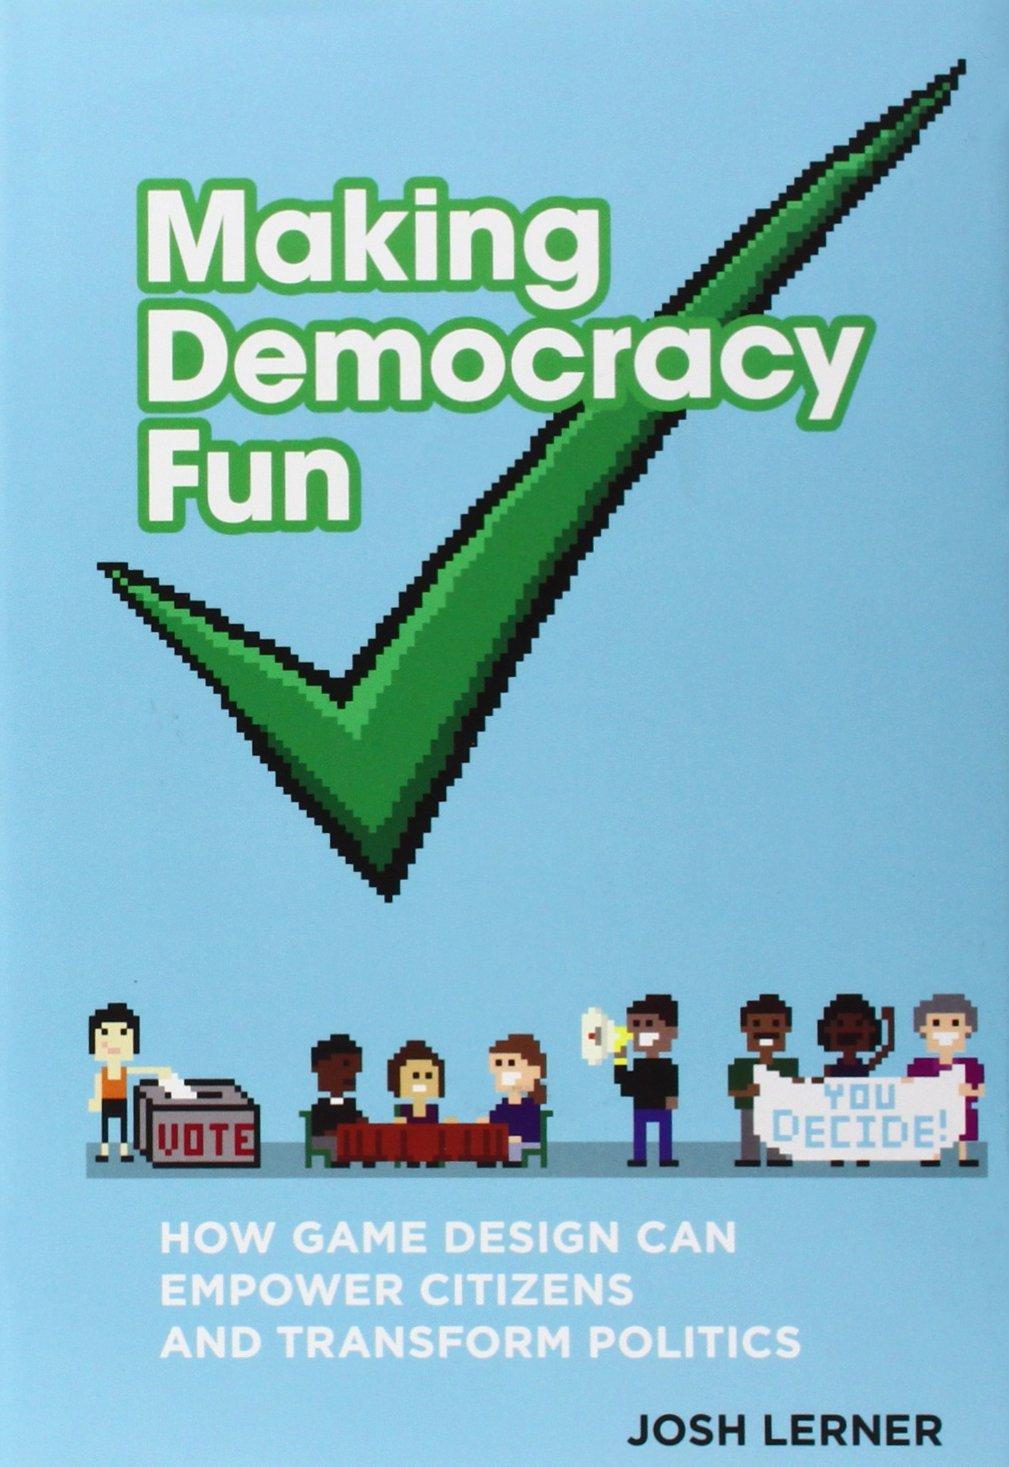 Making Democracy Fun: How Game Design Can Empower Citizens and Transform Politics (MIT Press)